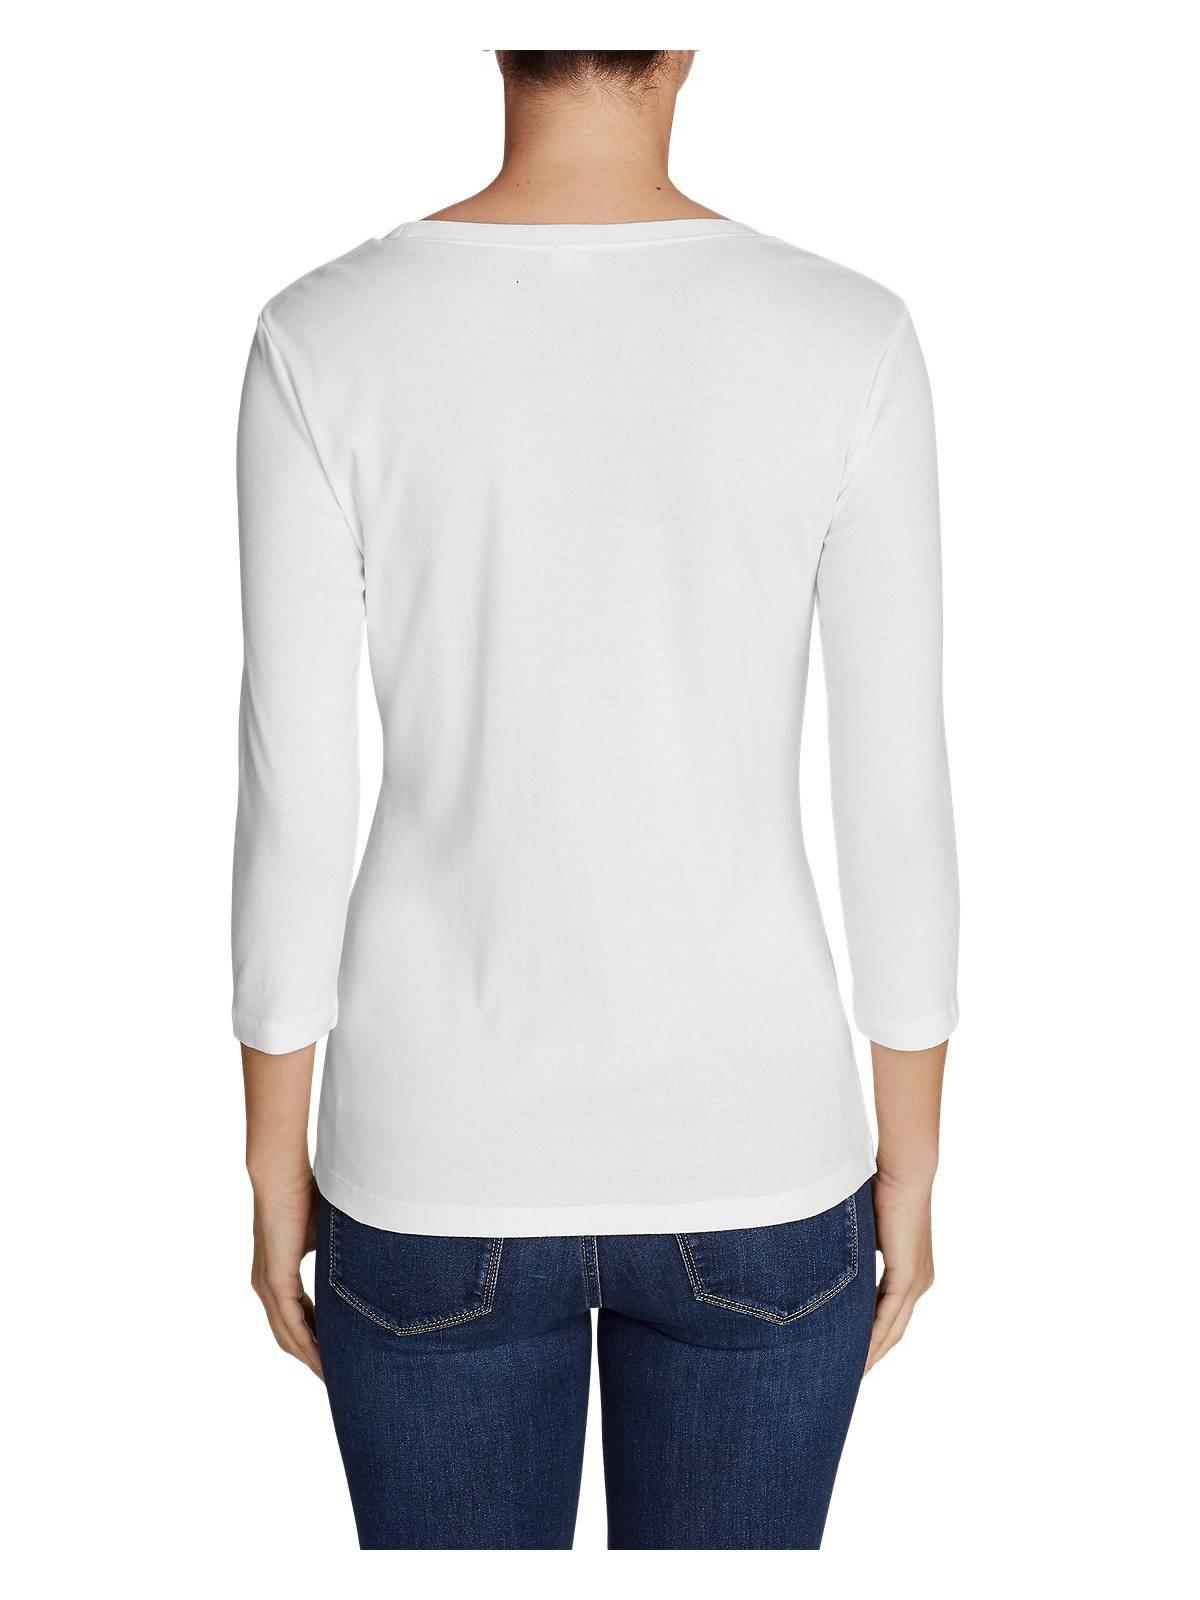 Eddie-Bauer-Women-039-s-Favorite-3-4-Sleeve-Scoop-Neck-T-Shirt thumbnail 22